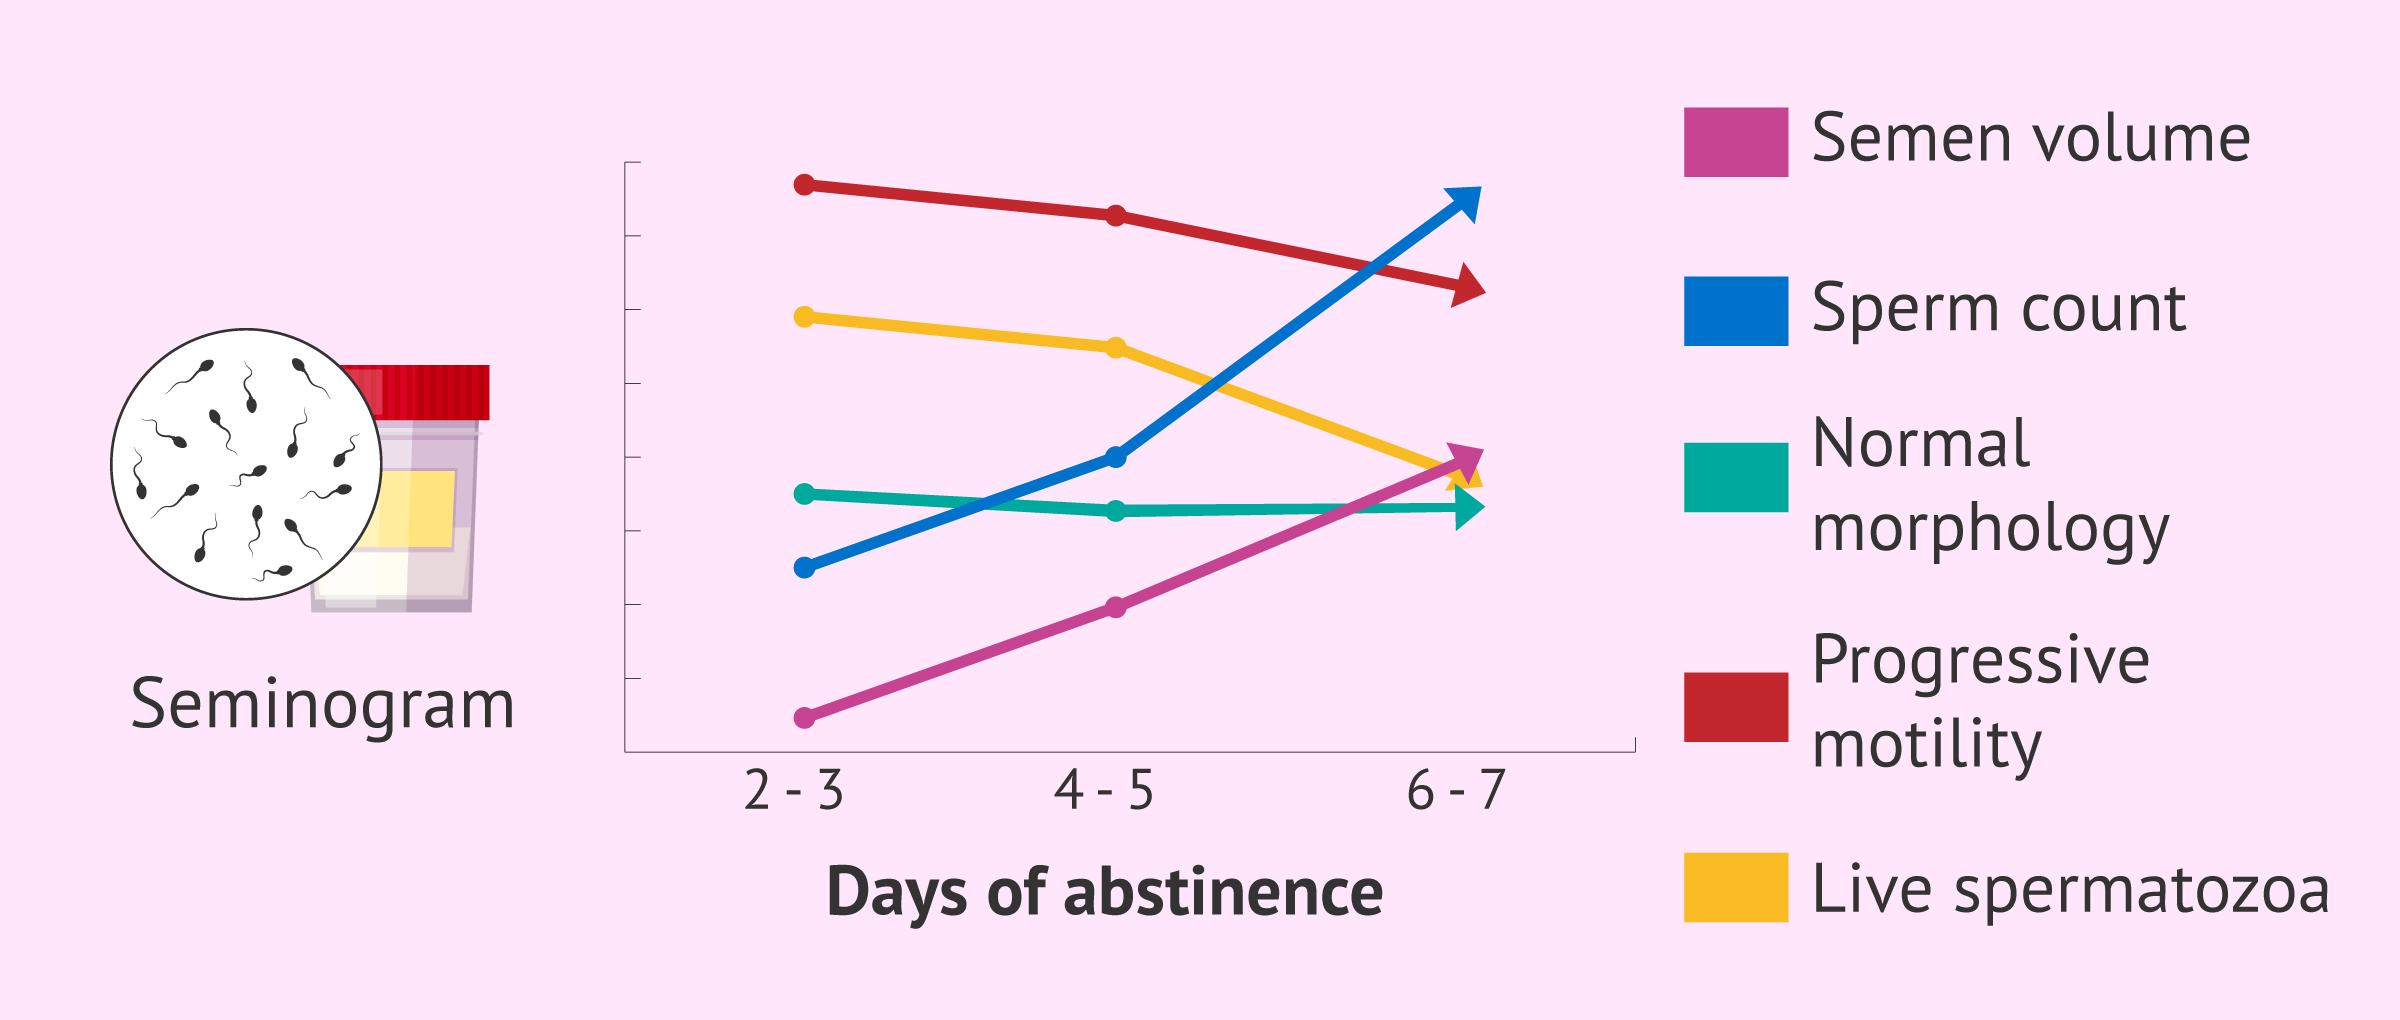 How do days of abstinence affect semen quality?